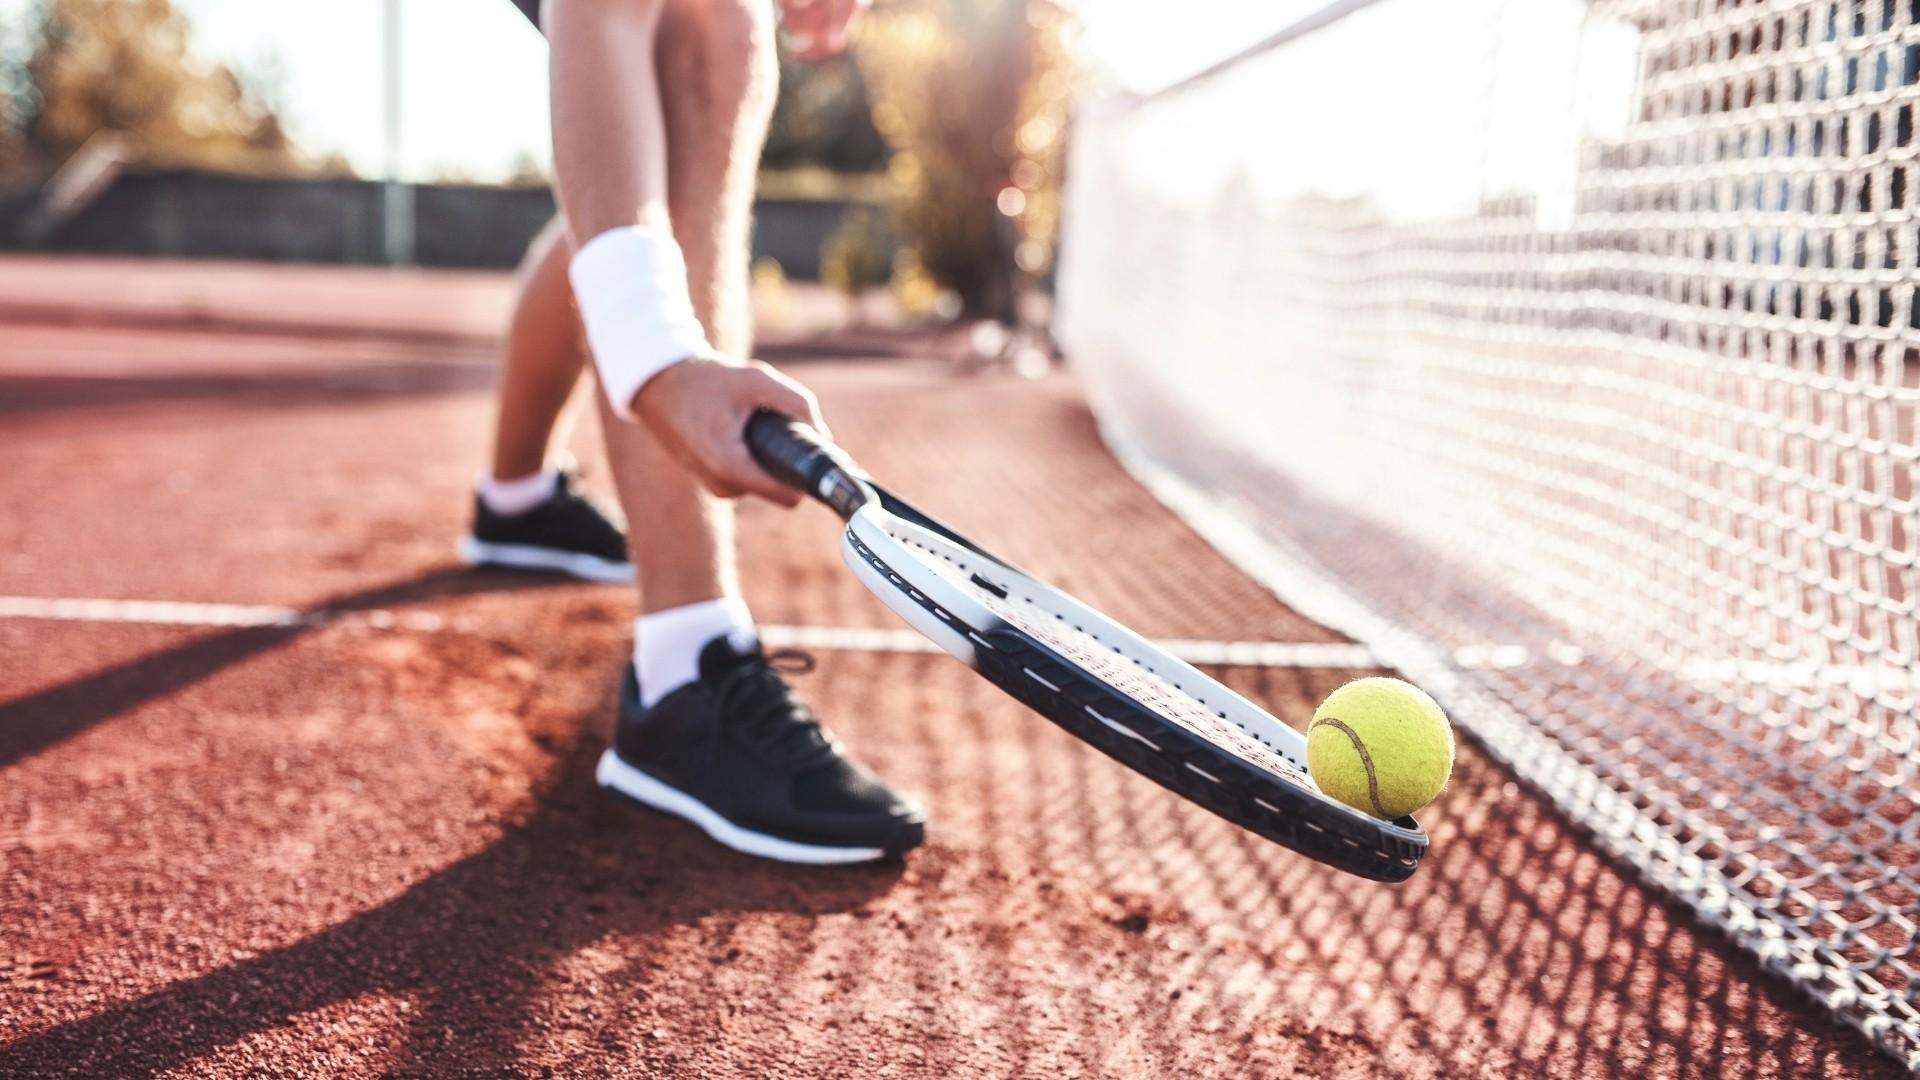 AGI Grass Tennis Courts